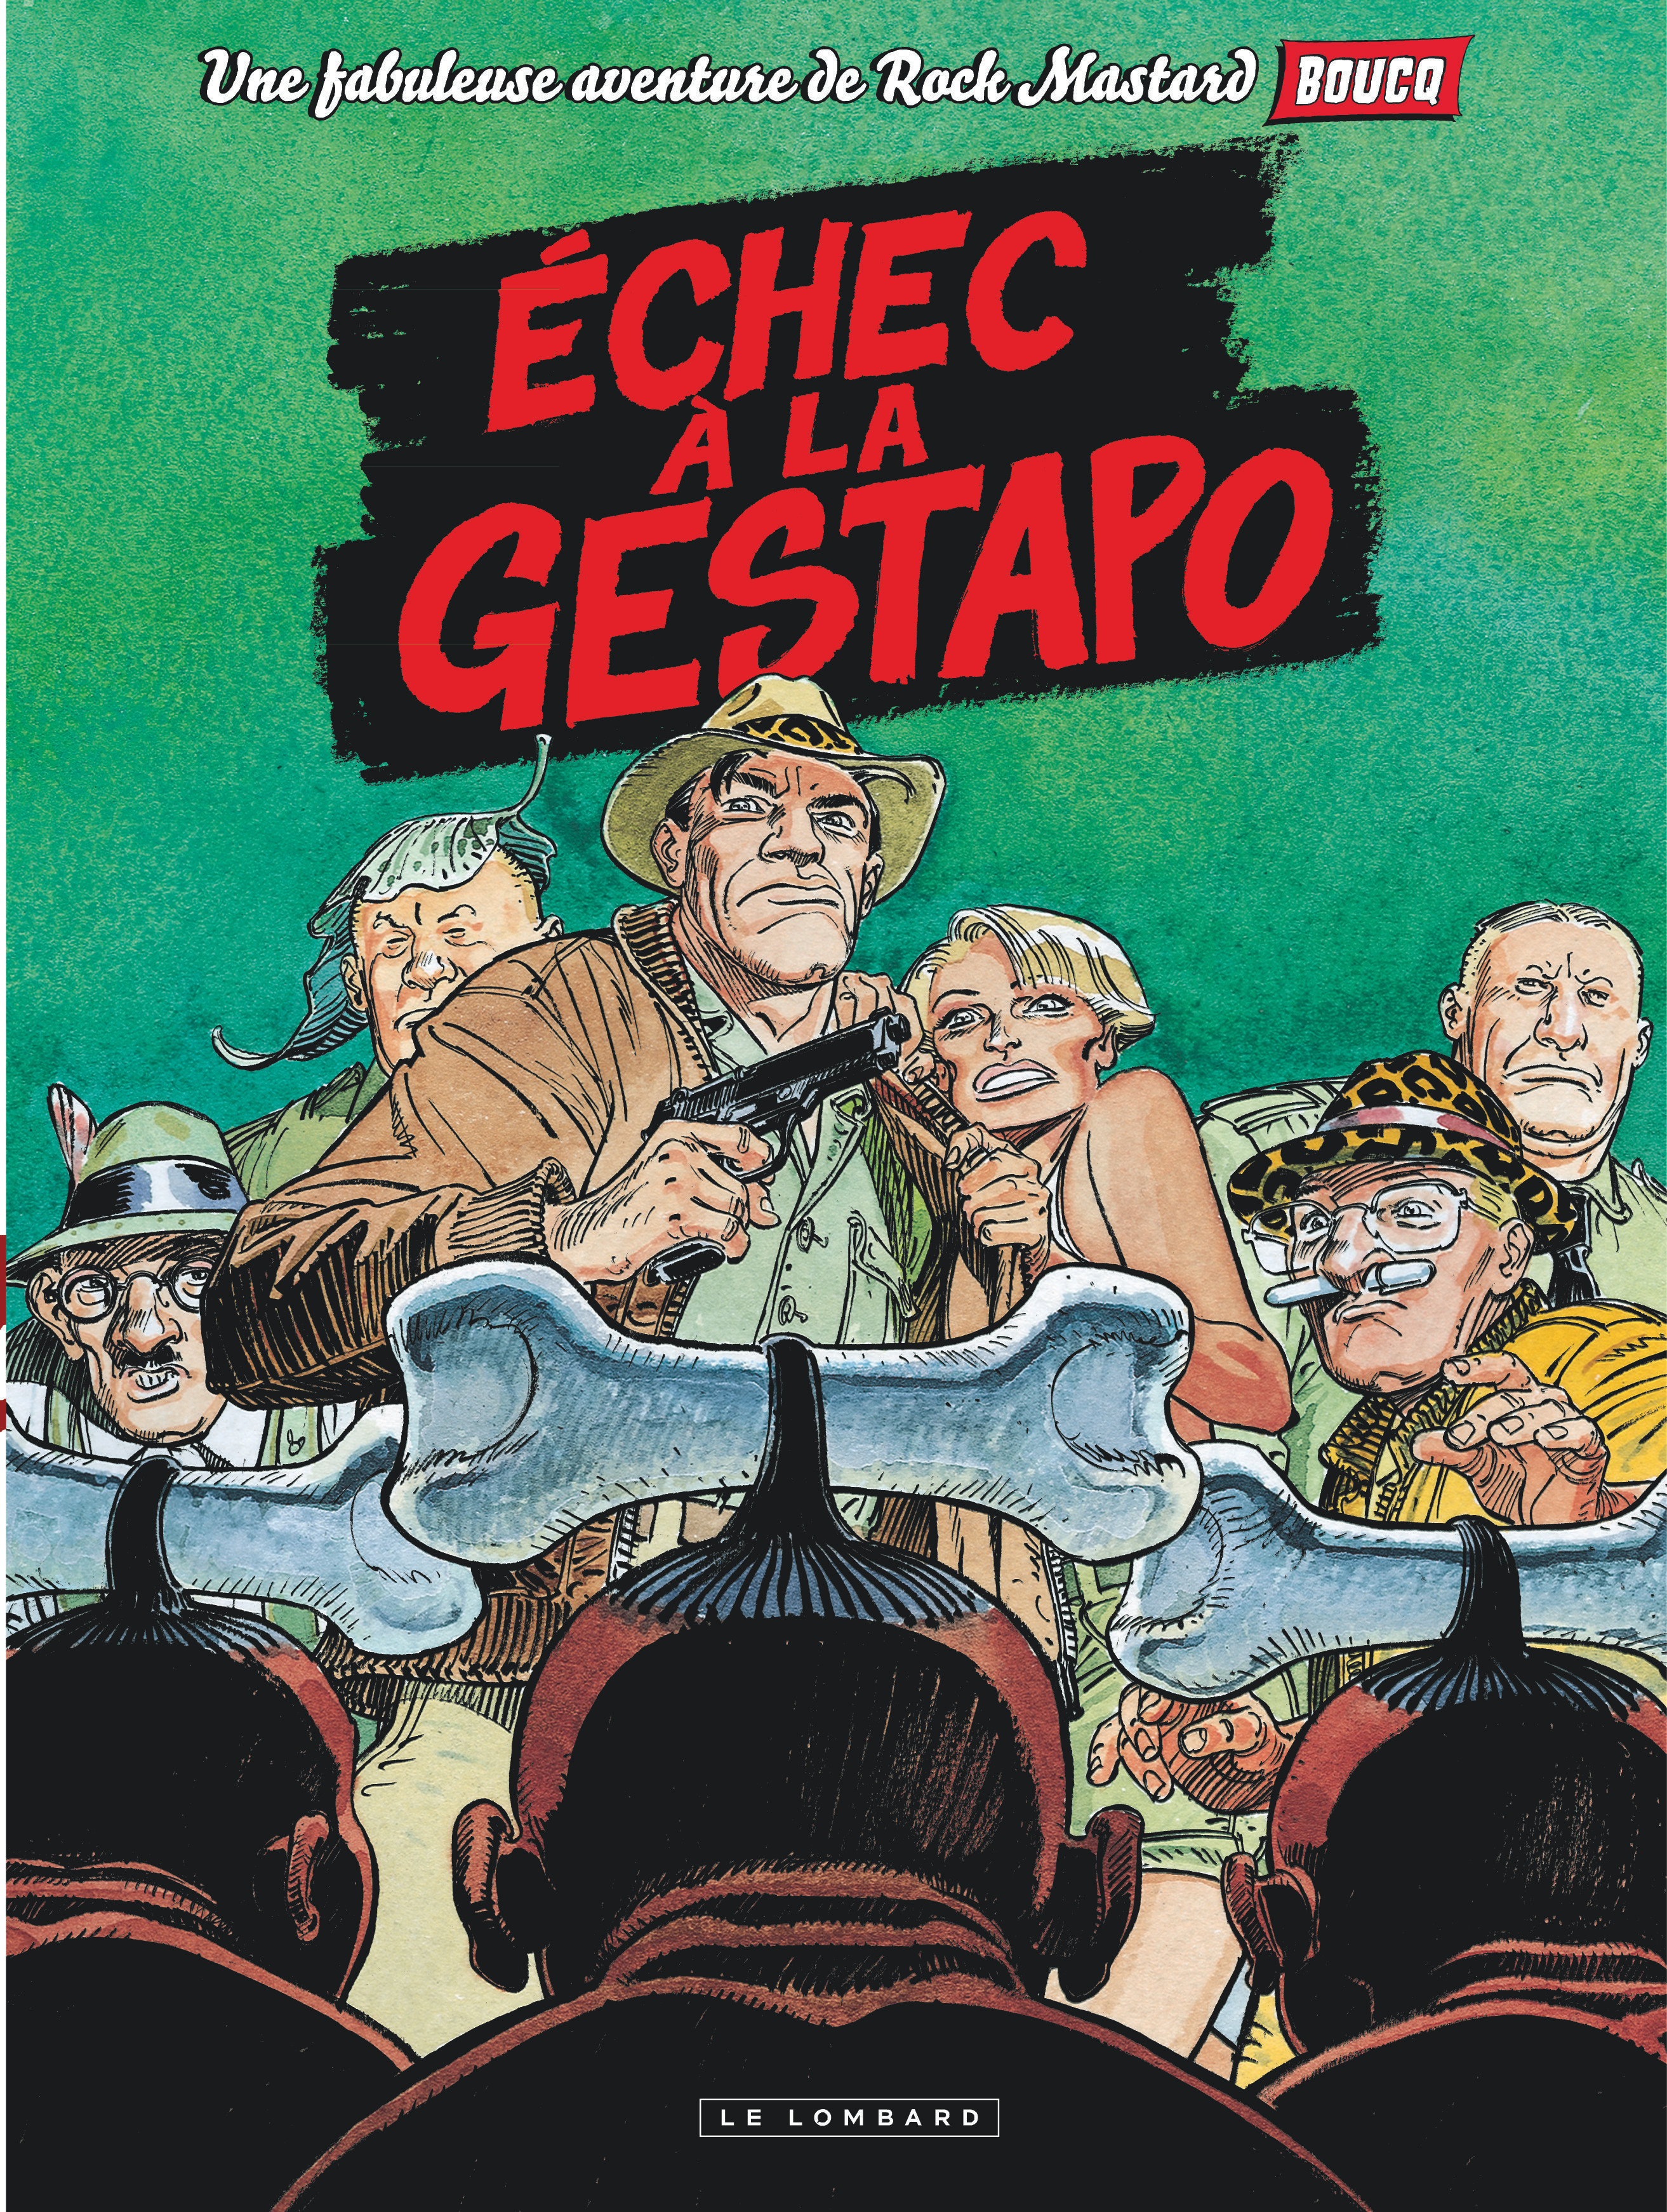 ECHEC A LA GESTAPO - ROCK MASTARD - T1